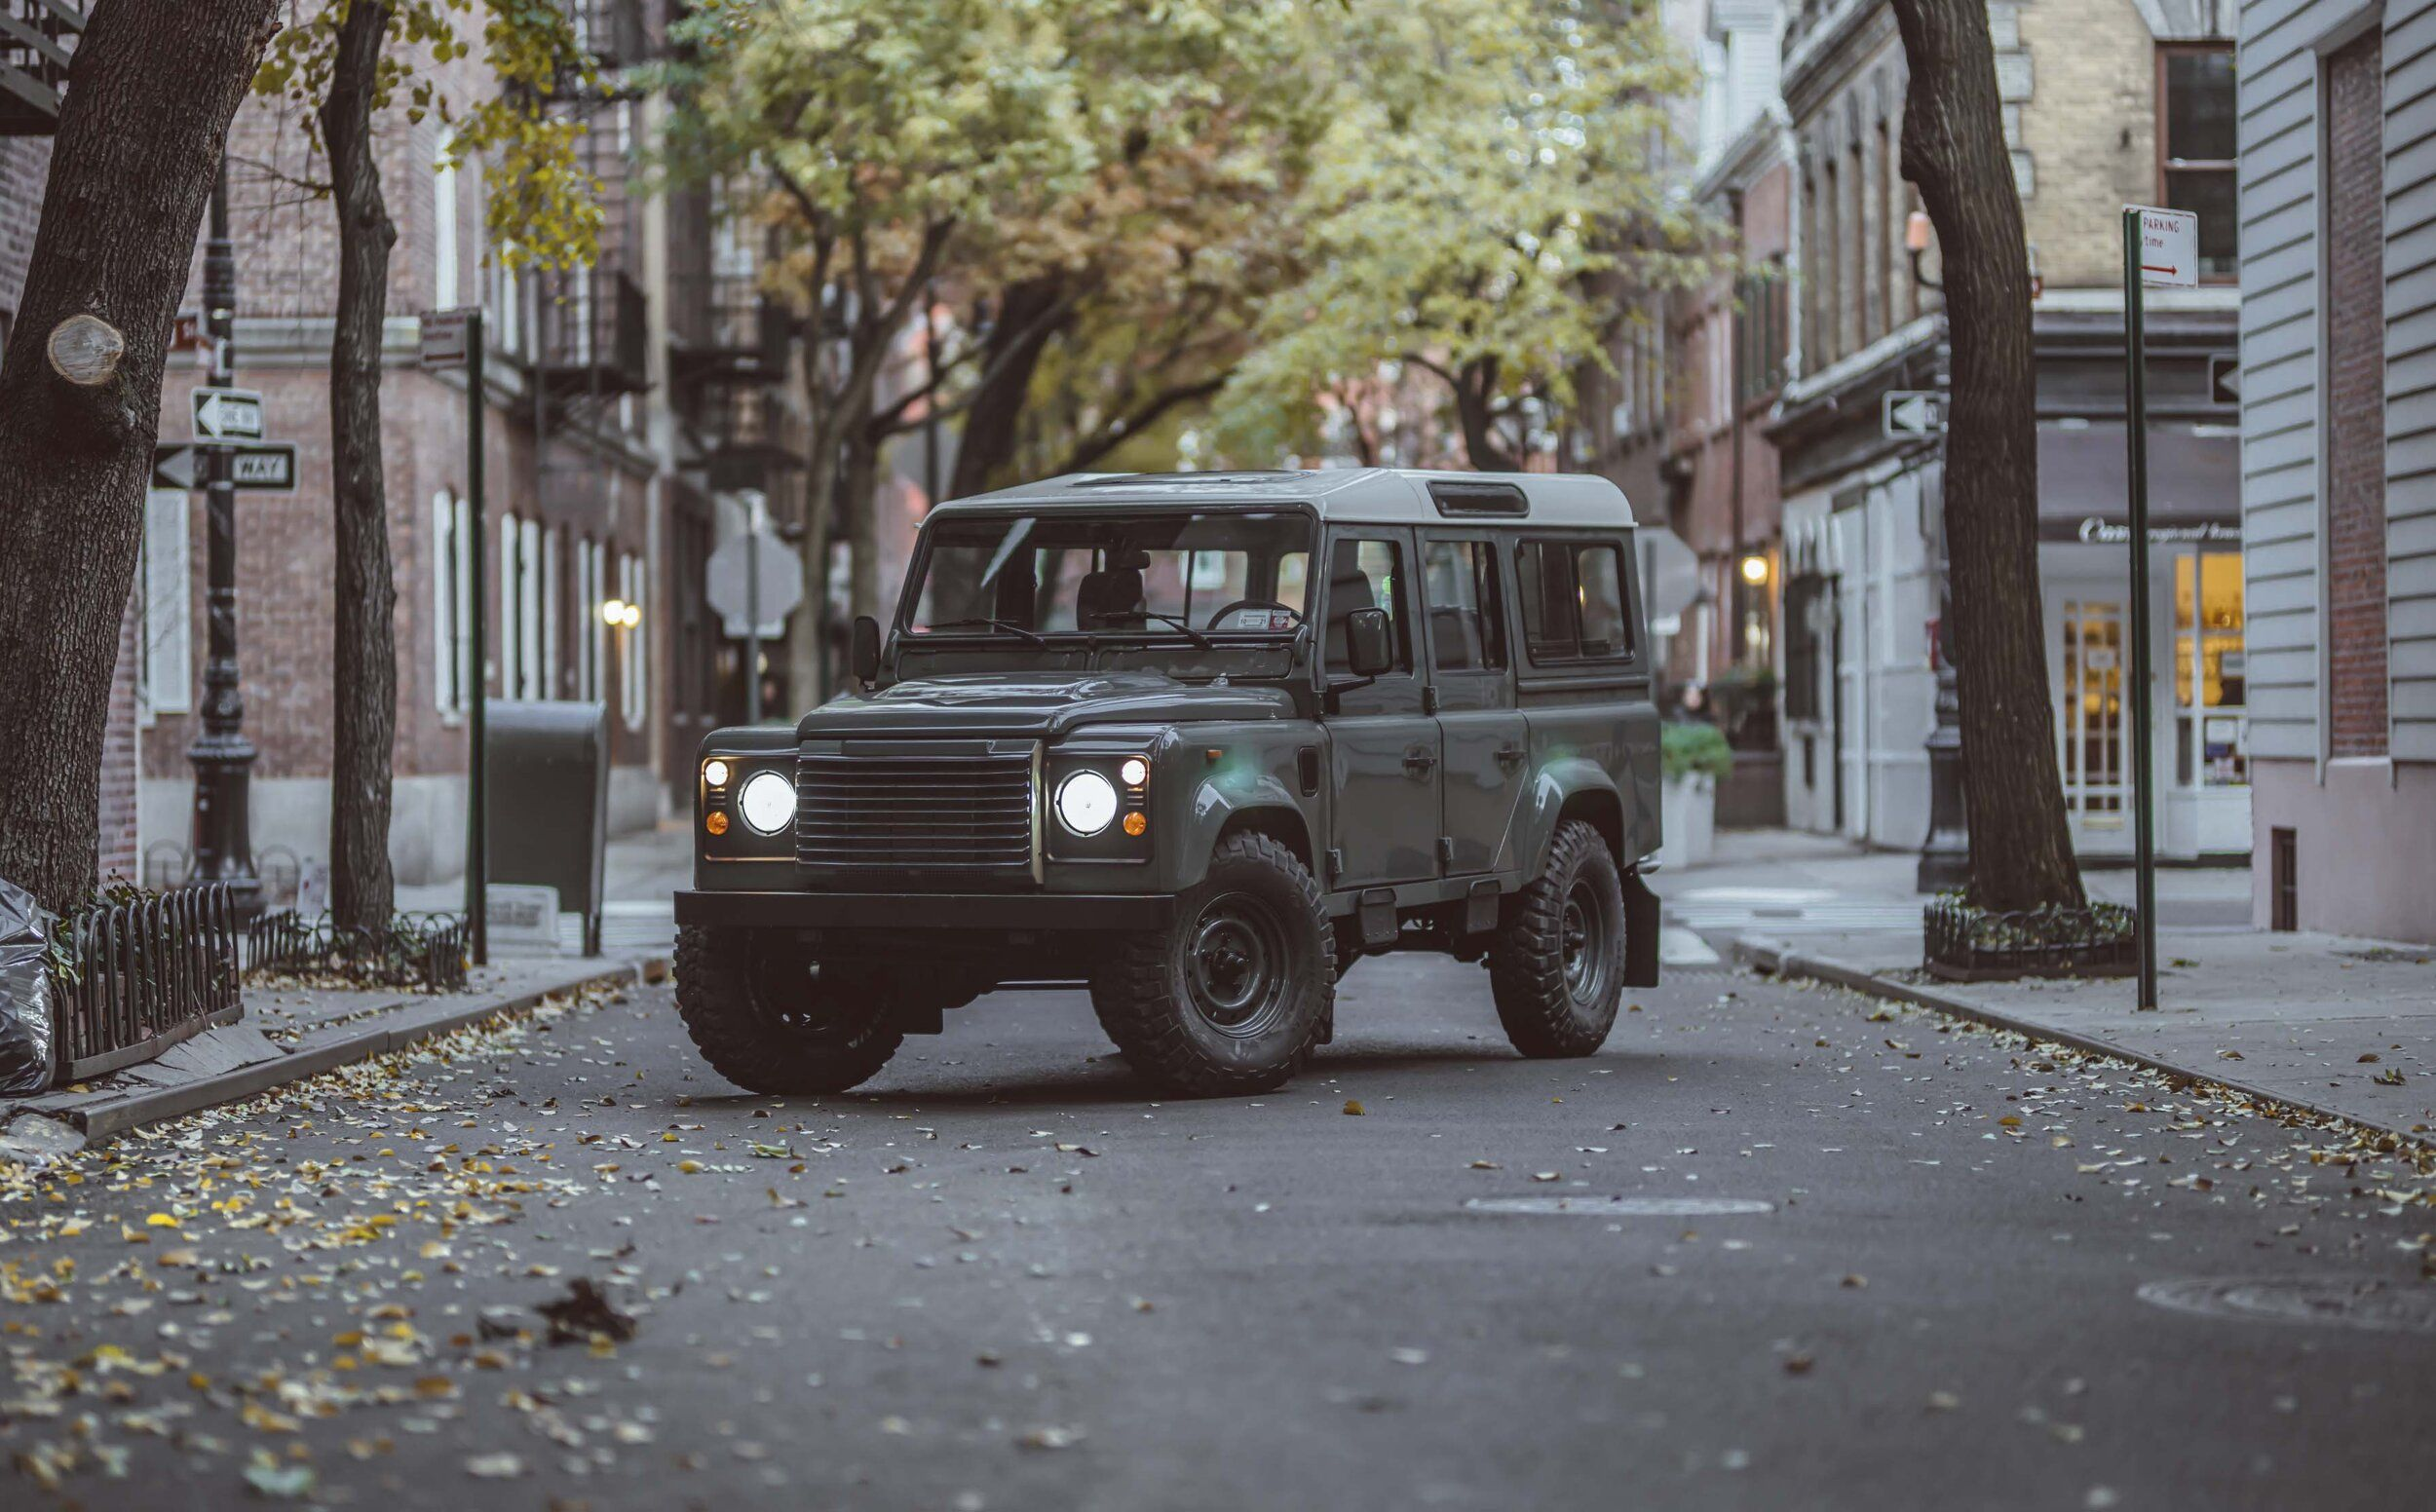 Brooklyn Coachworks Defender 110 Keswick Green Brooklyn Coachworks Defender 110 Land Rover Defender 110 Defender